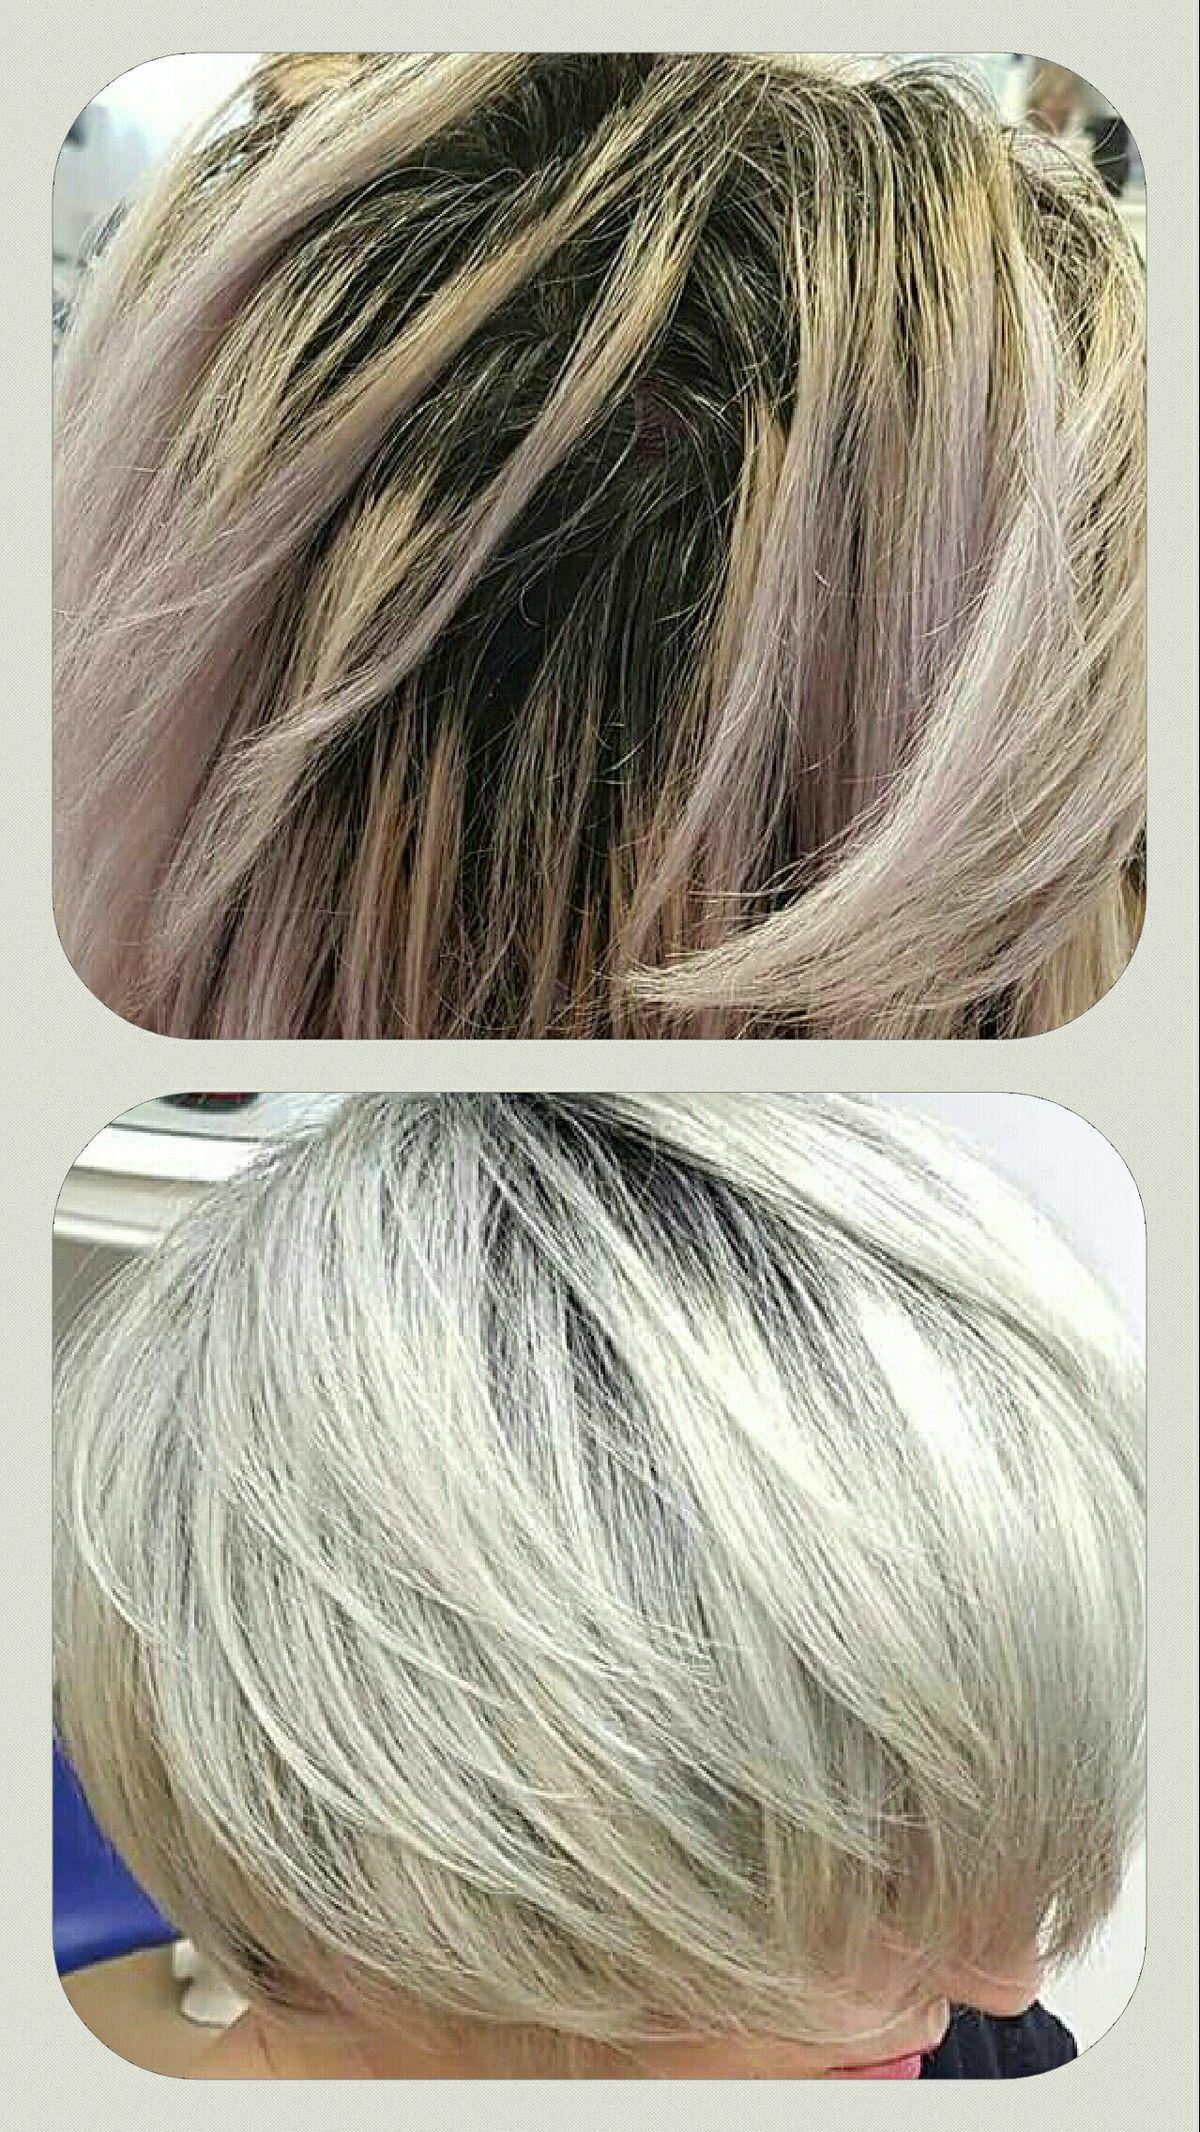 Pin on Bagham Barn Hair Chilham UK